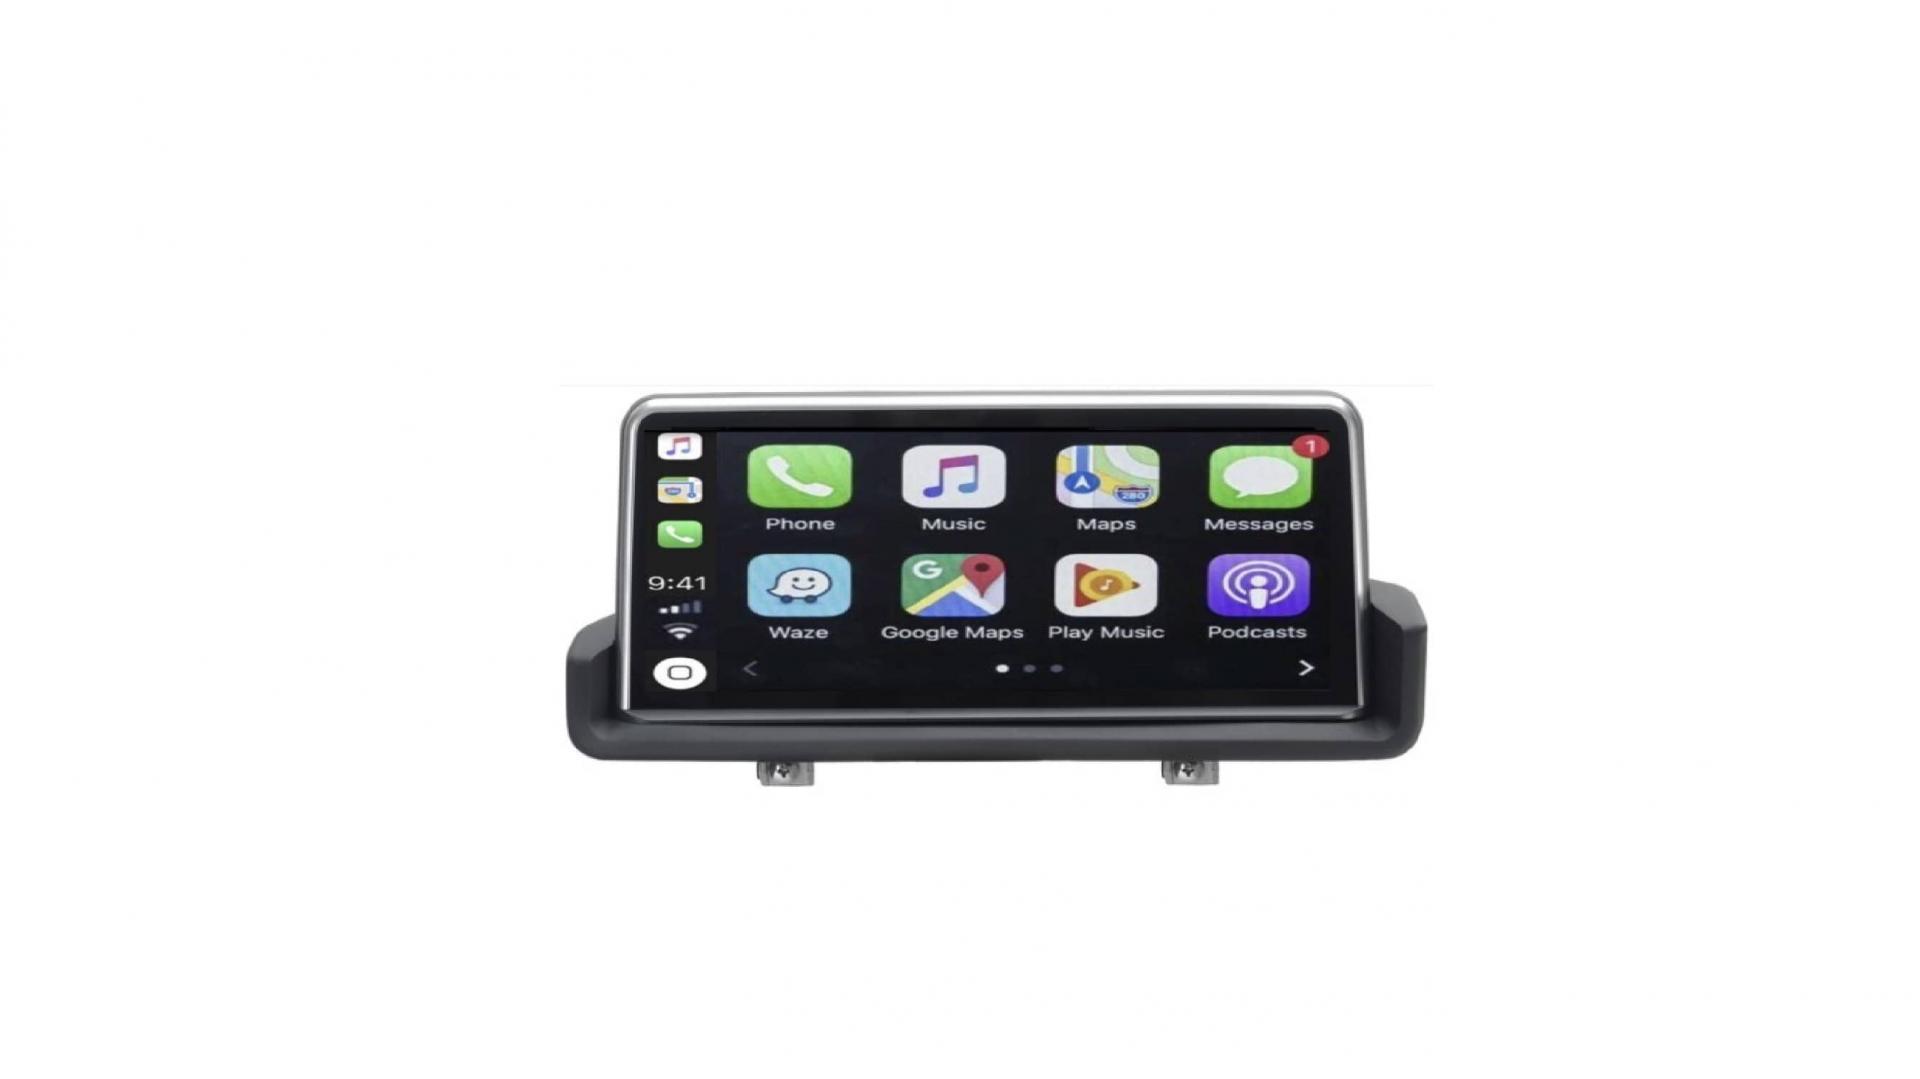 Autoradio gps bmw serie 3 90 91 92 93 bluetooth autoradio gps android bmw camera de recul commande au volant ipod tv 3g 4g pas cher wifi poste usb sd tnt double 2 din tactile canbu